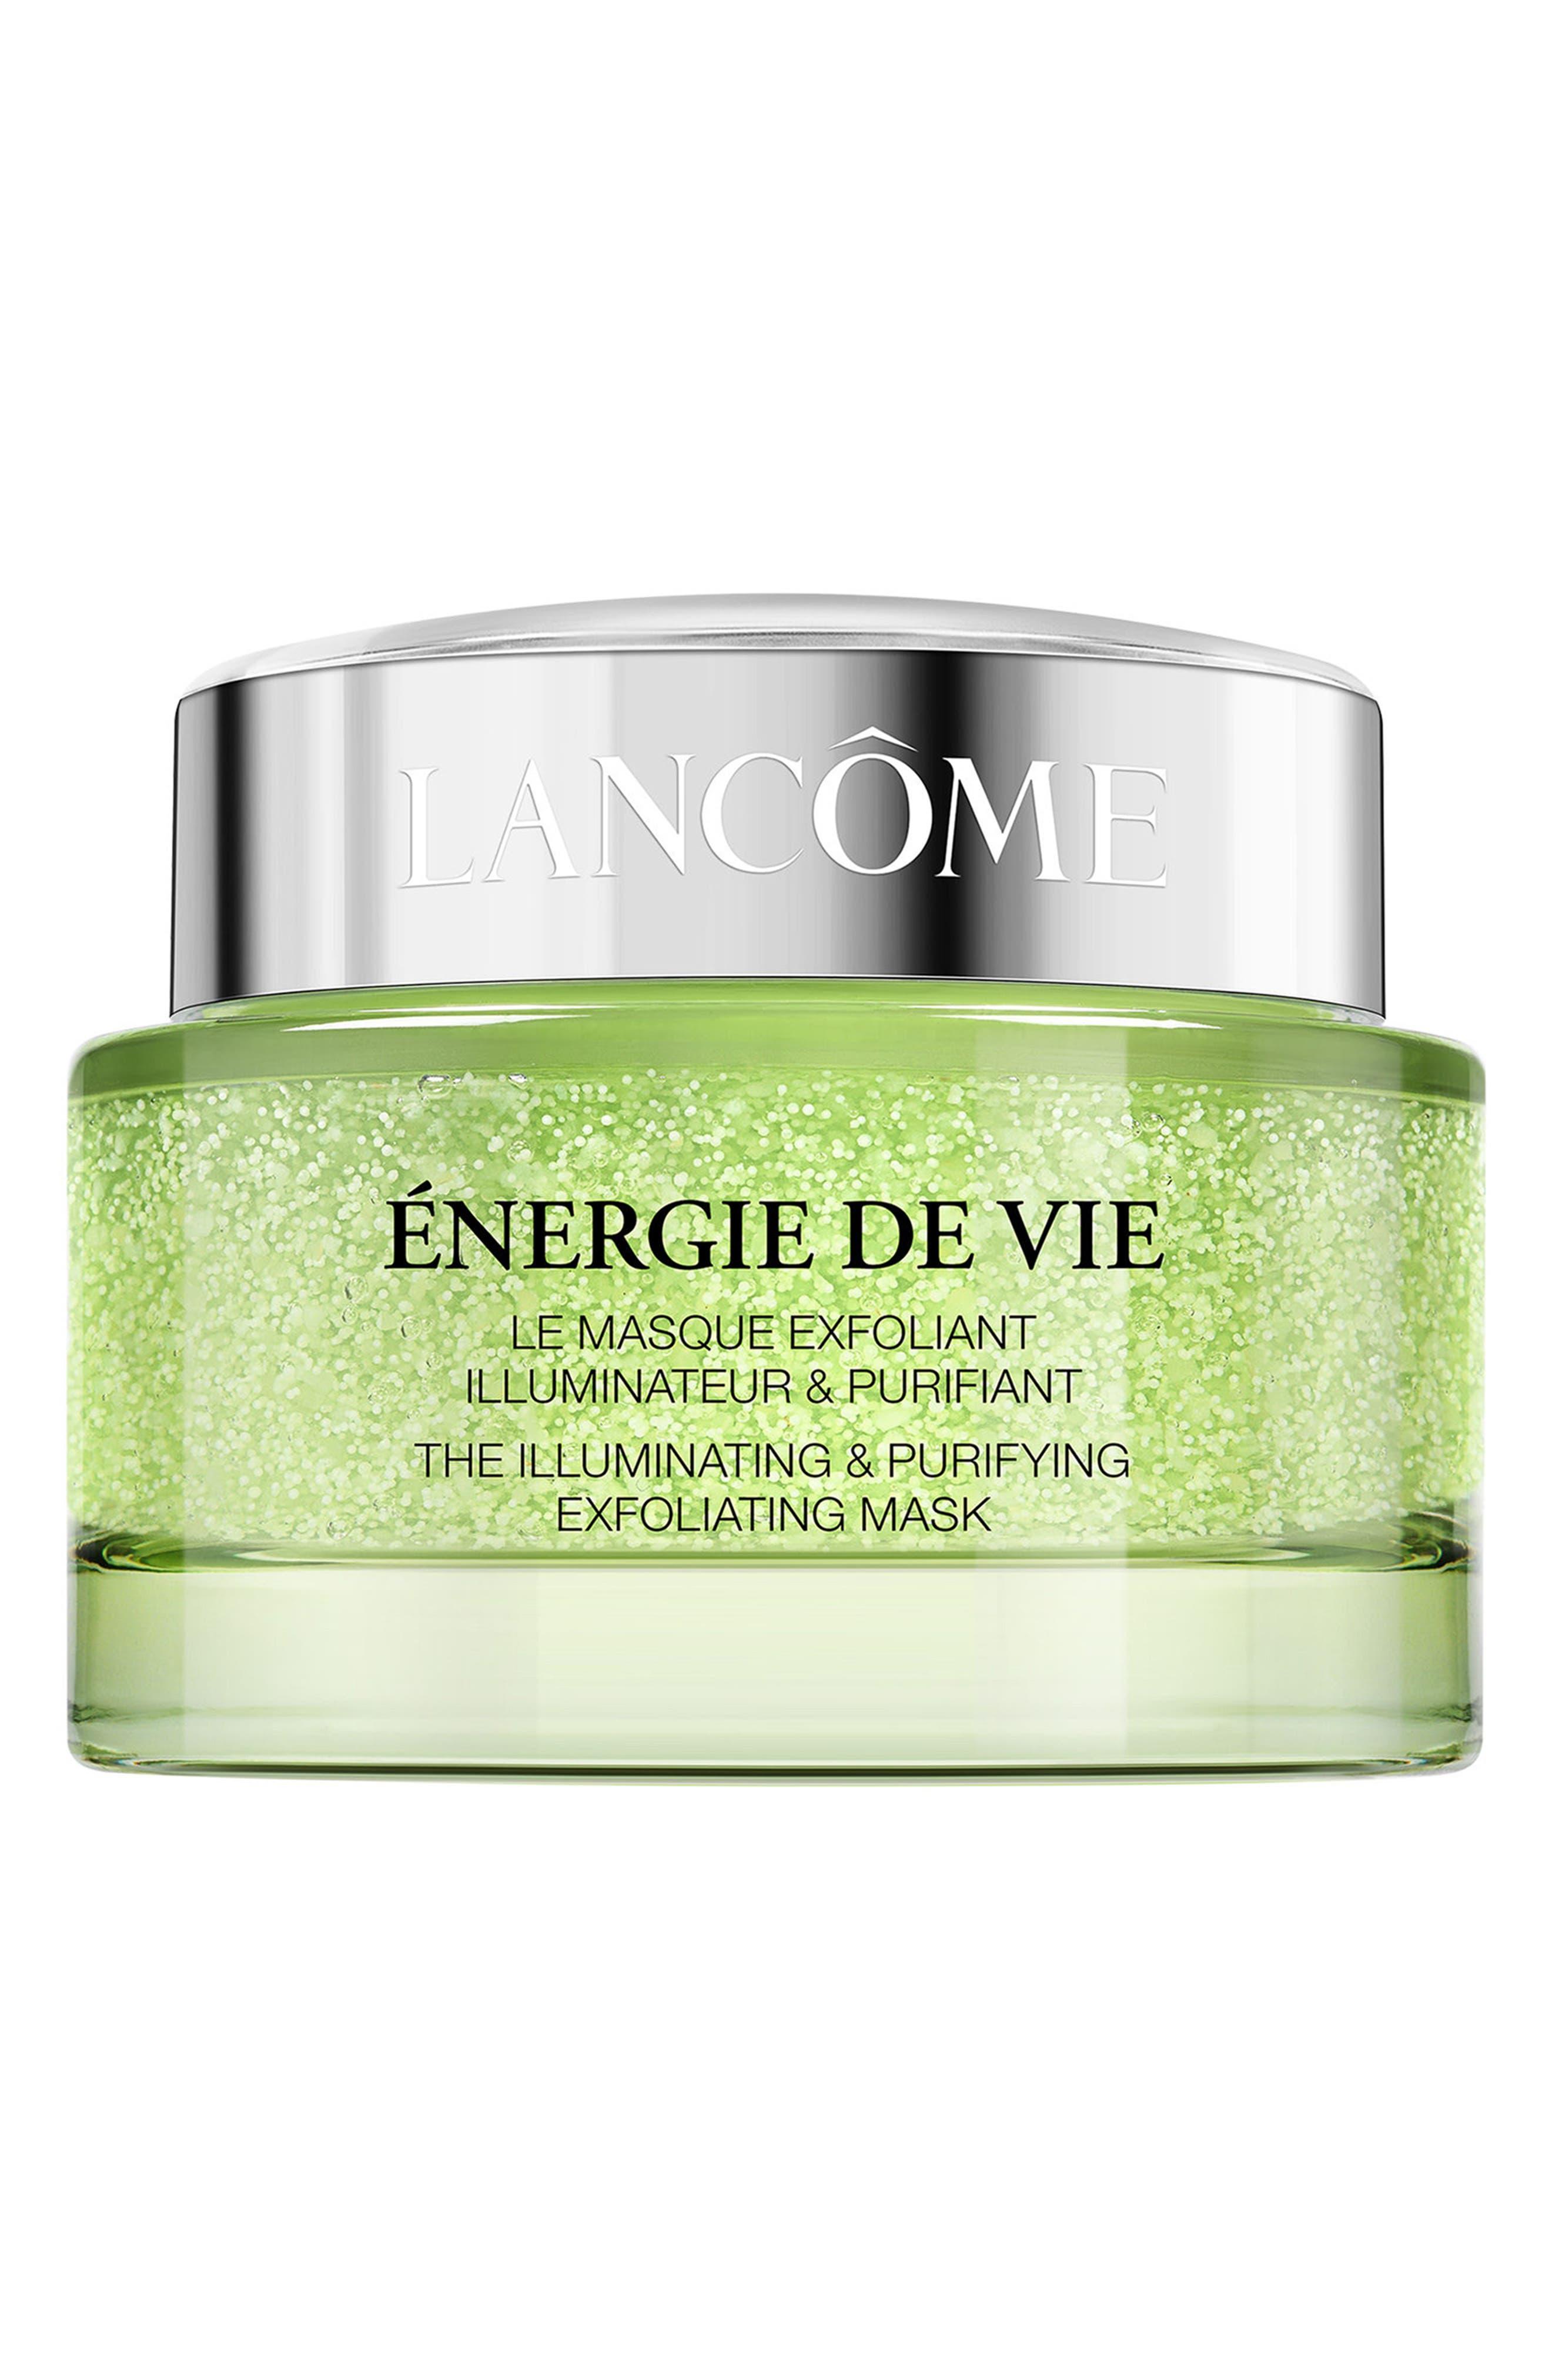 LANCÔME Energie de Vie The Illuminating & Purifying Exfoliating Mask, Main, color, NO COLOR